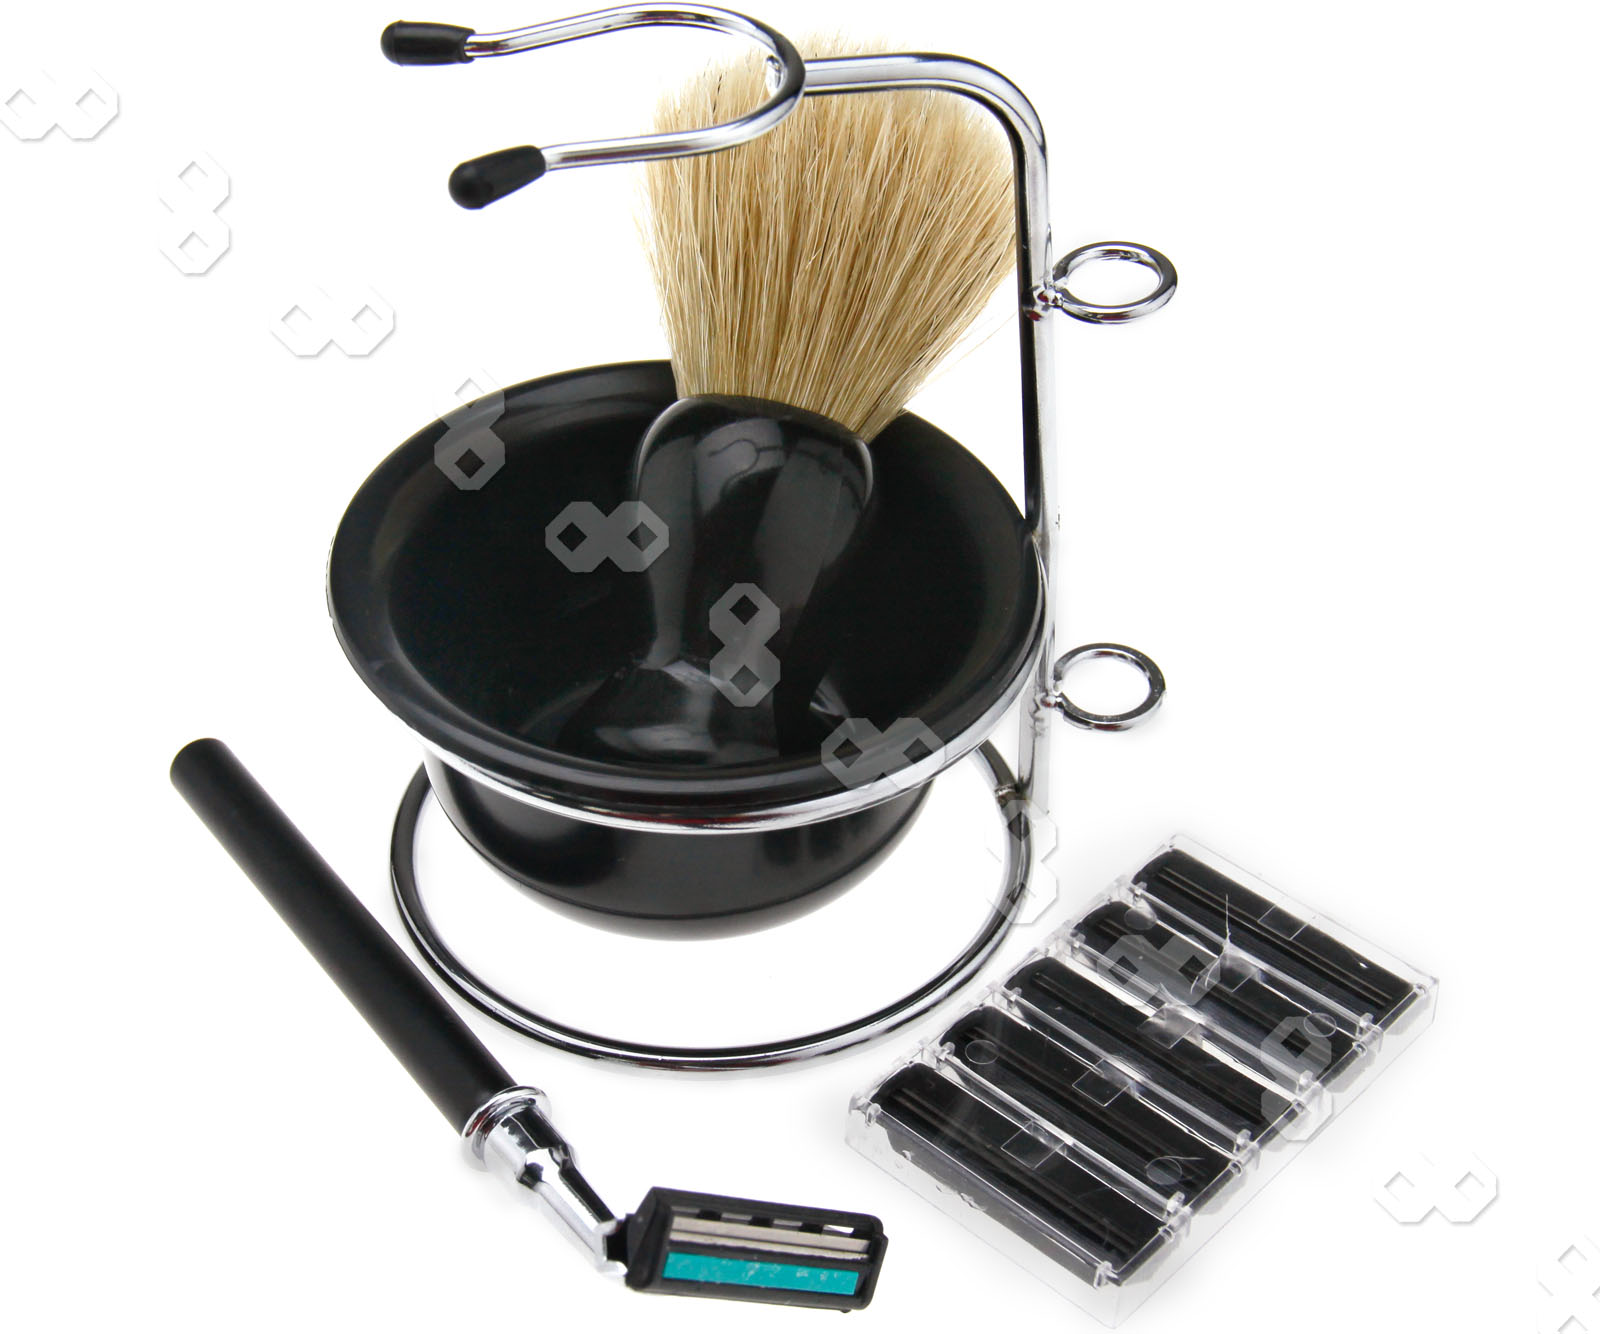 beard grooming kit hong kong the emirates high street remington vacuum beard the emirates high. Black Bedroom Furniture Sets. Home Design Ideas